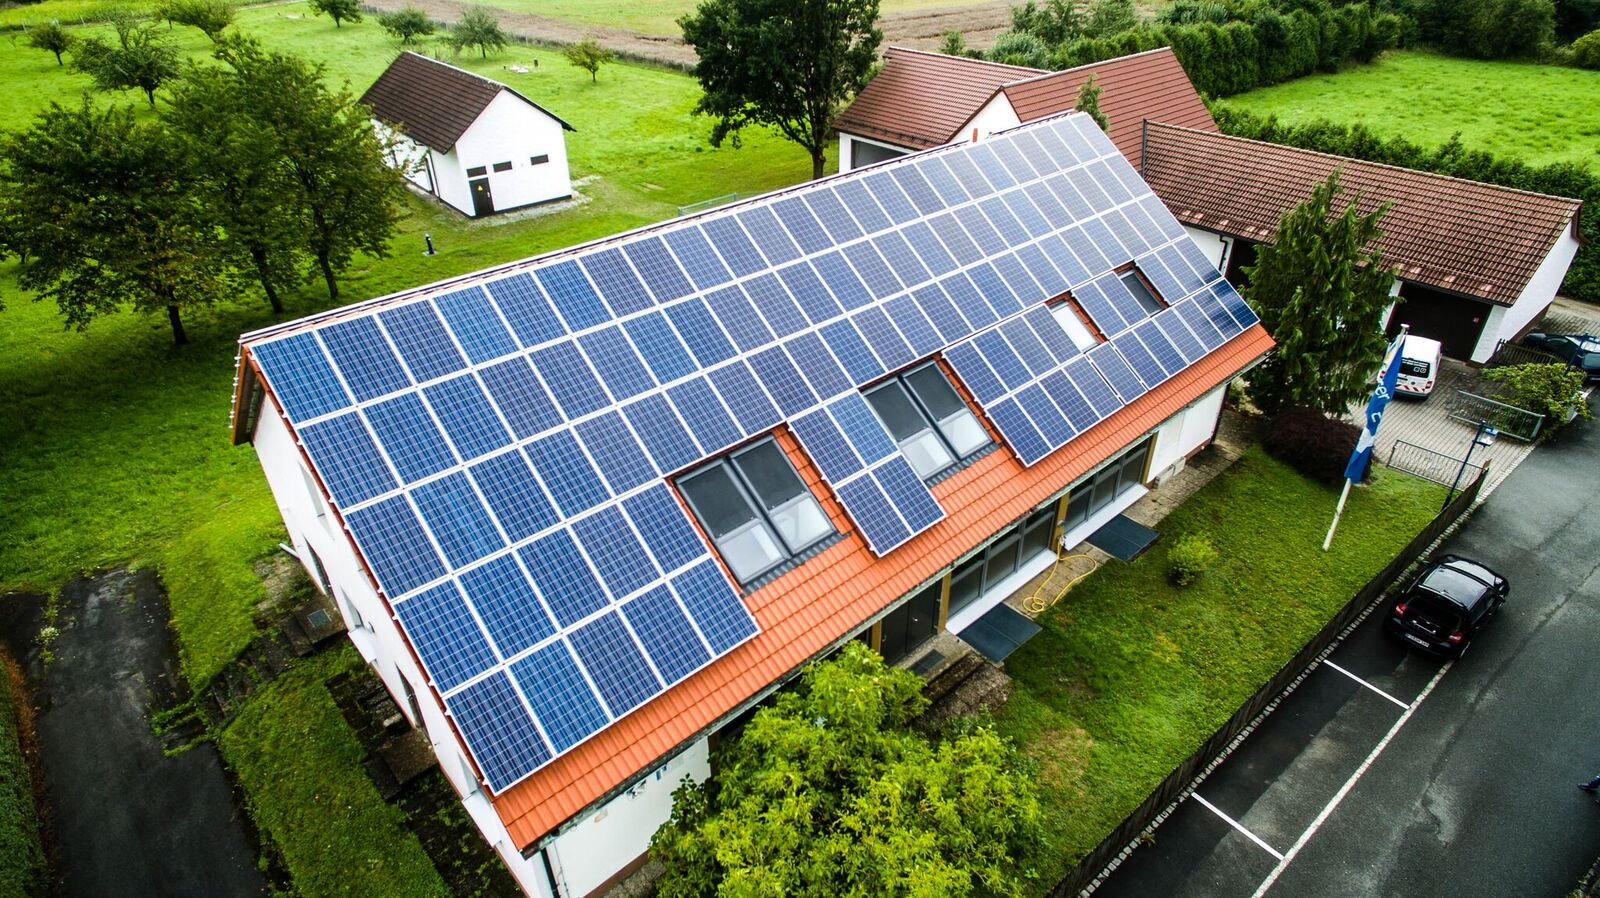 photovoltaik solar speicher n rnberg solar photovoltaik waermepumpe. Black Bedroom Furniture Sets. Home Design Ideas